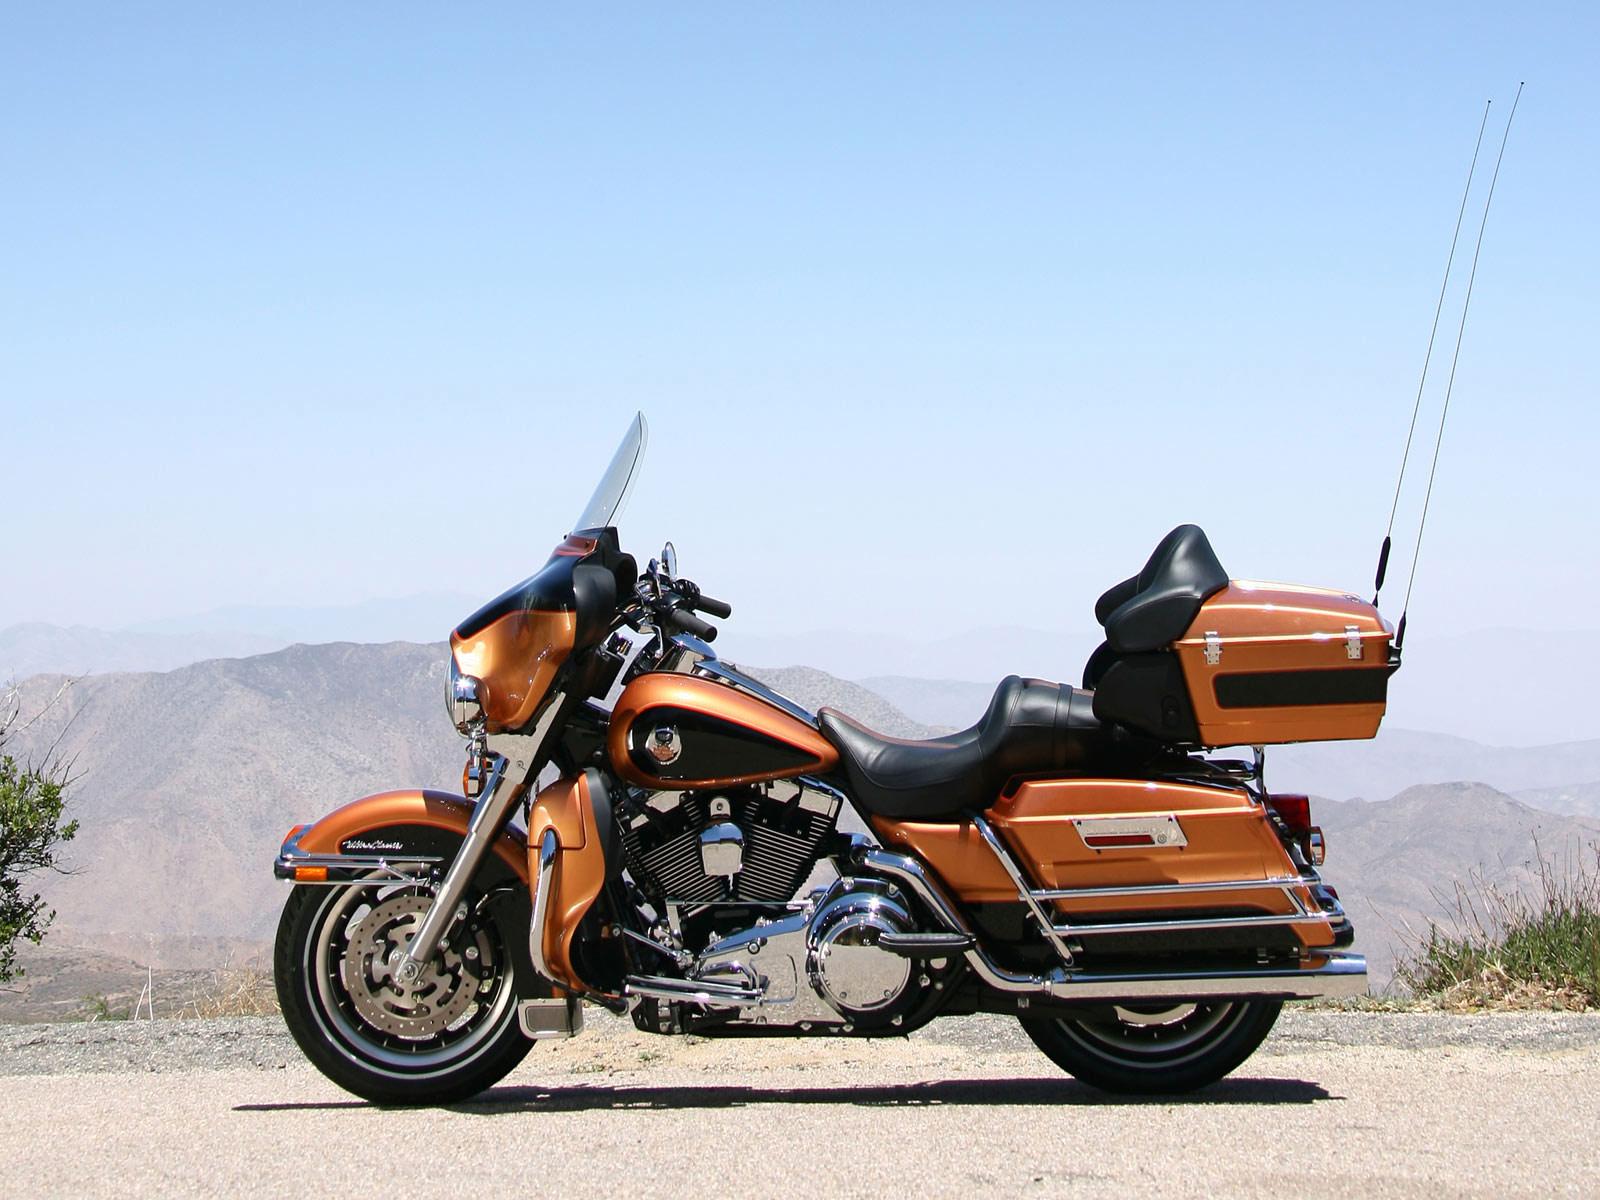 Harley Davidson Flhtcu Ultra Classic Electra Glide Review